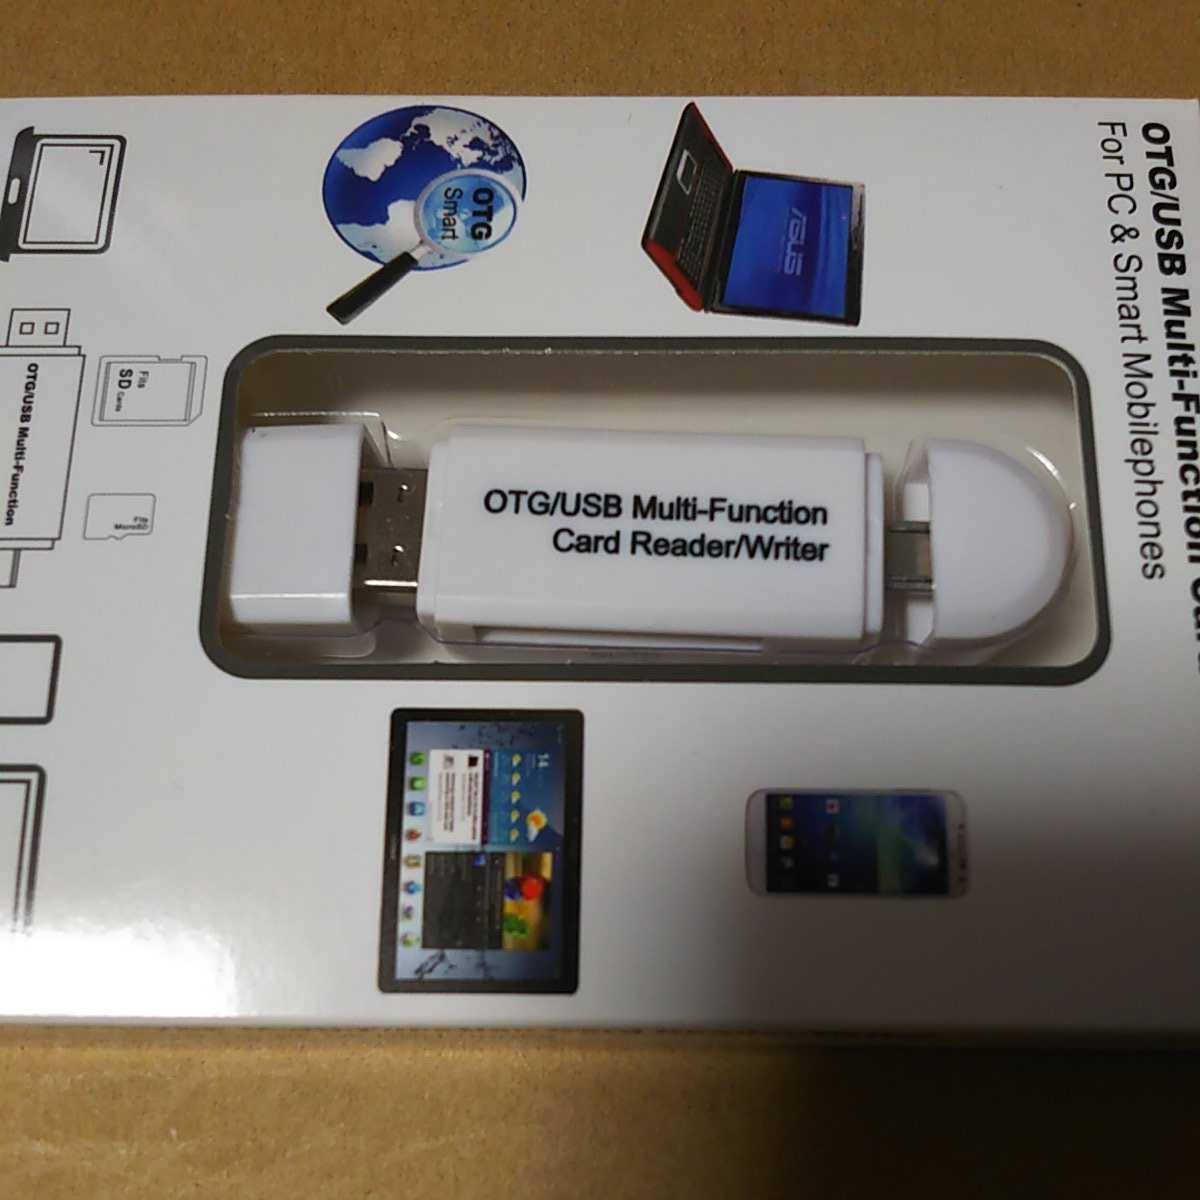 ◆SDカードリーダー USB メモリーカードリーダー MicroSD マルチカードリーダー ホワイト